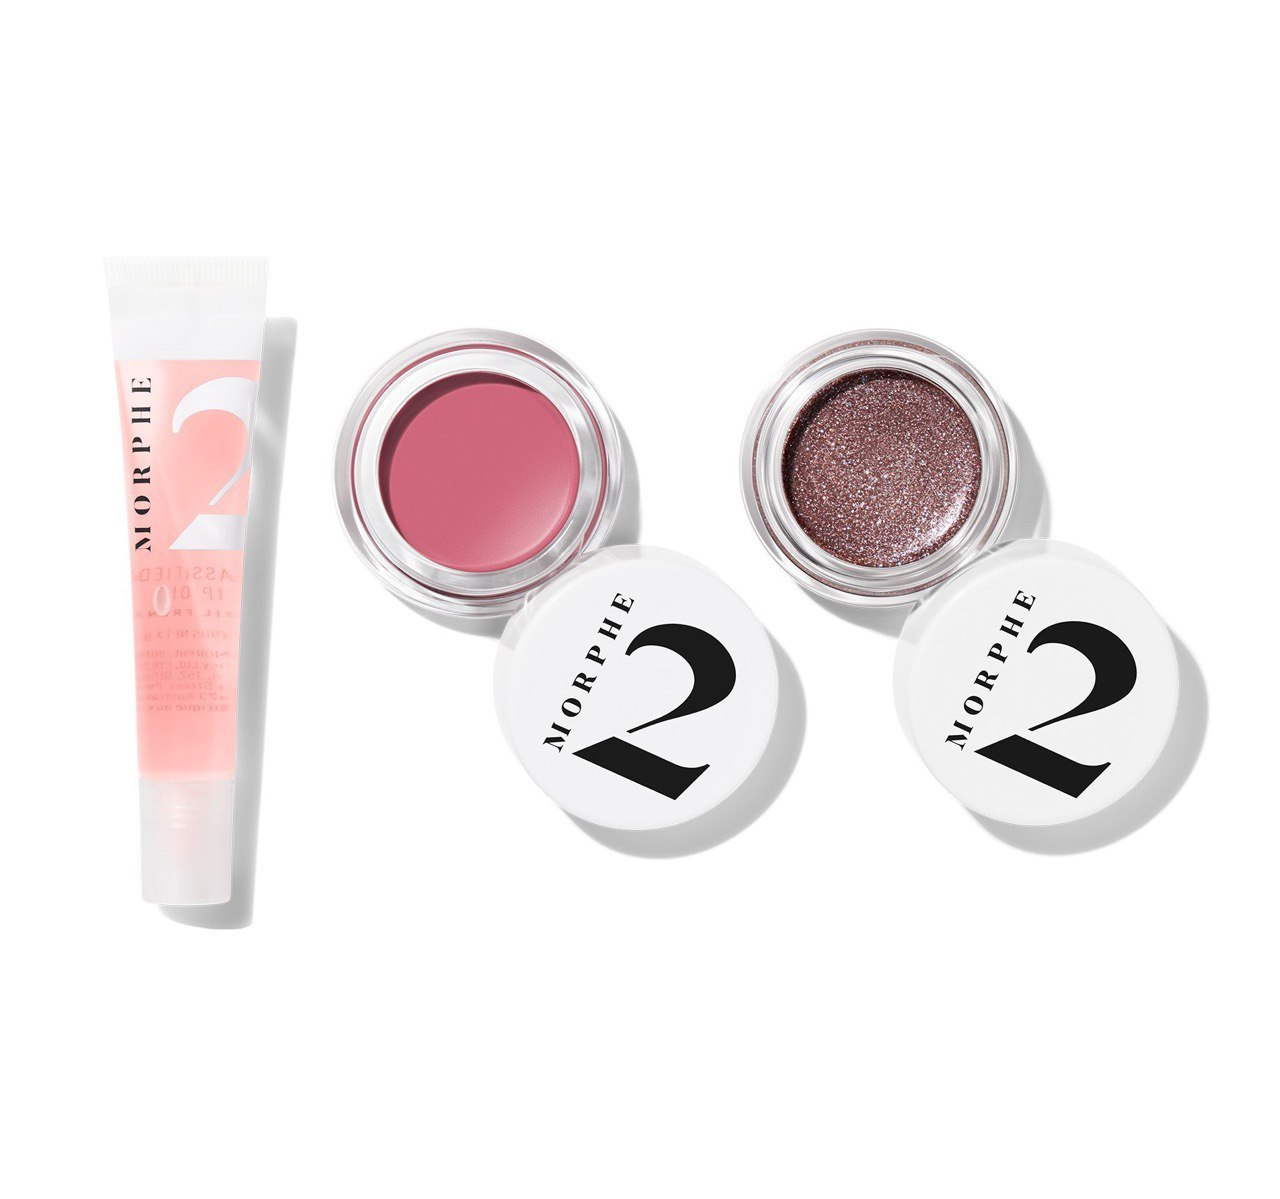 Набор Morphe 2 The Fresh Set 3-Piece Makeup Bundle